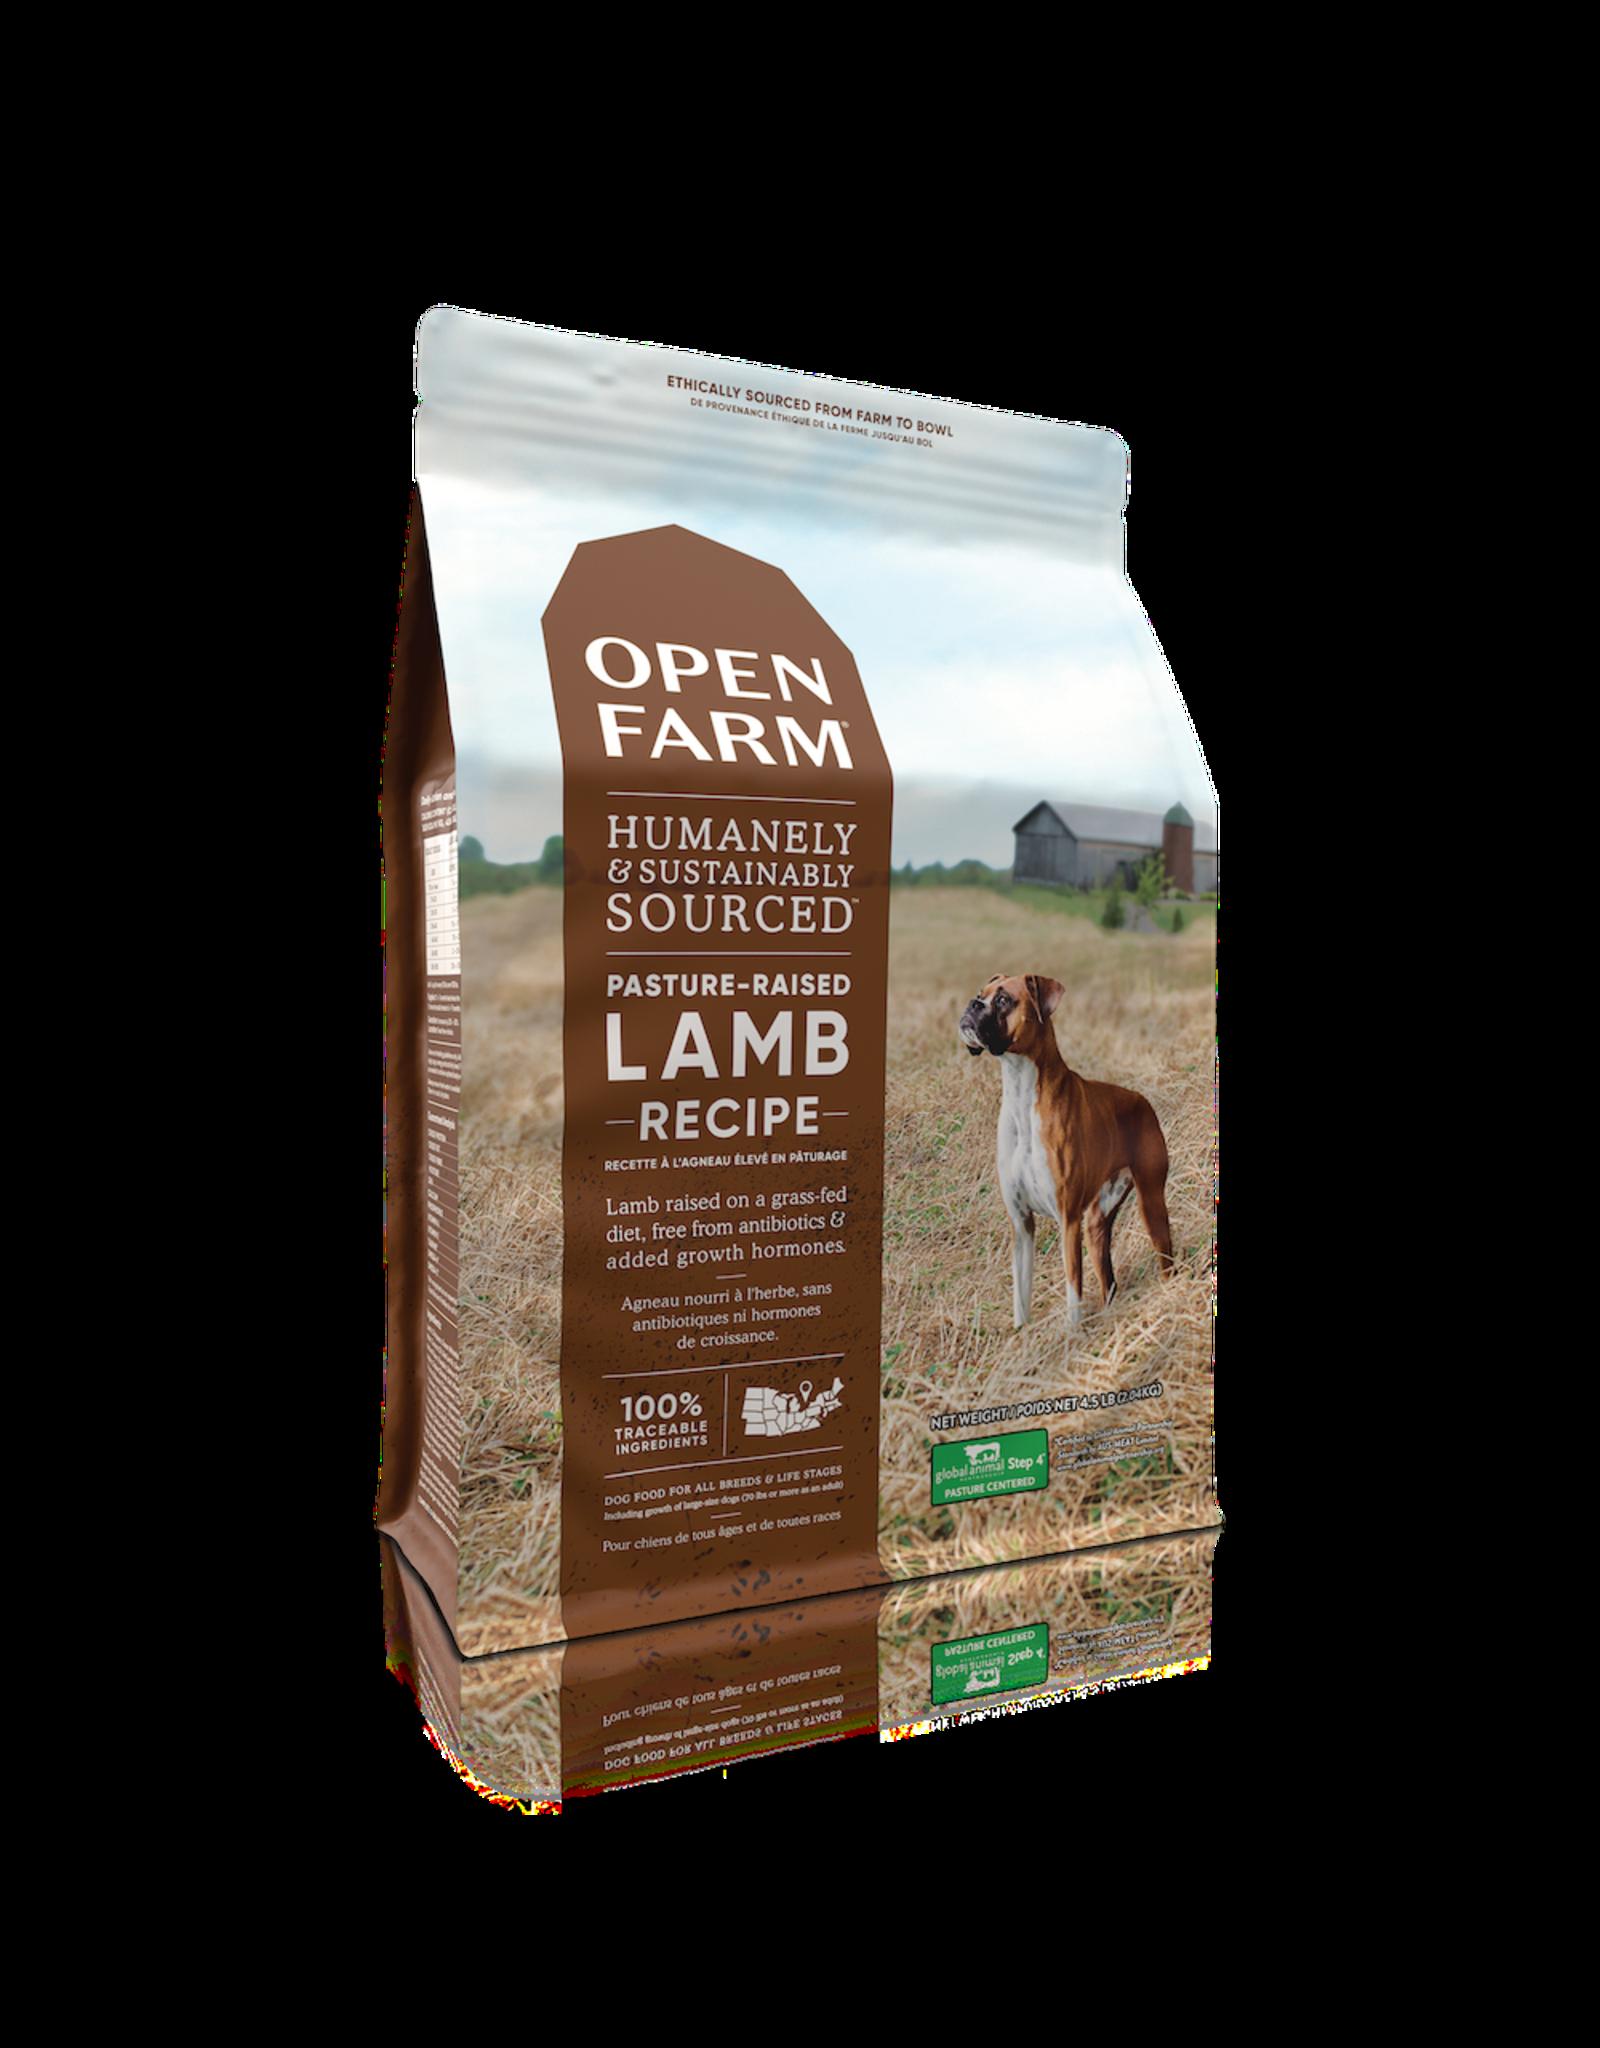 Open Farm OPEN FARM DOG PASTURE-RAISED LAMB RECIPE